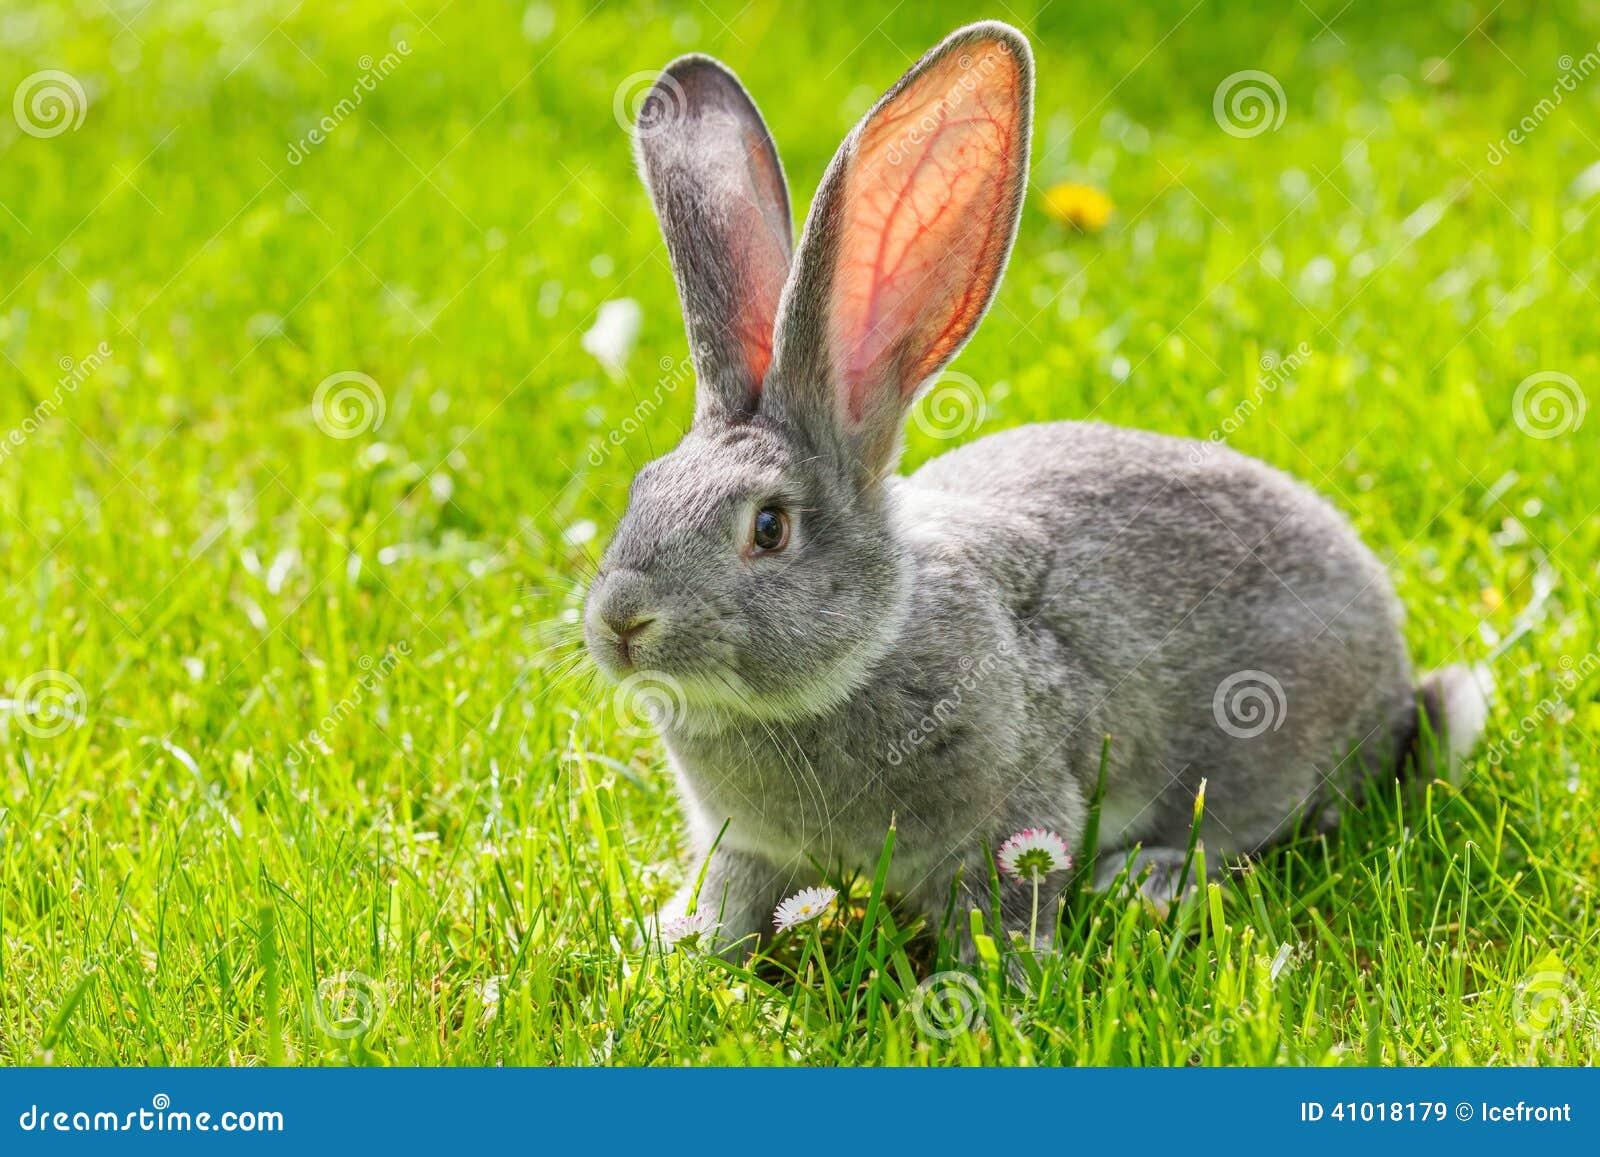 Grey rabbit in green grass